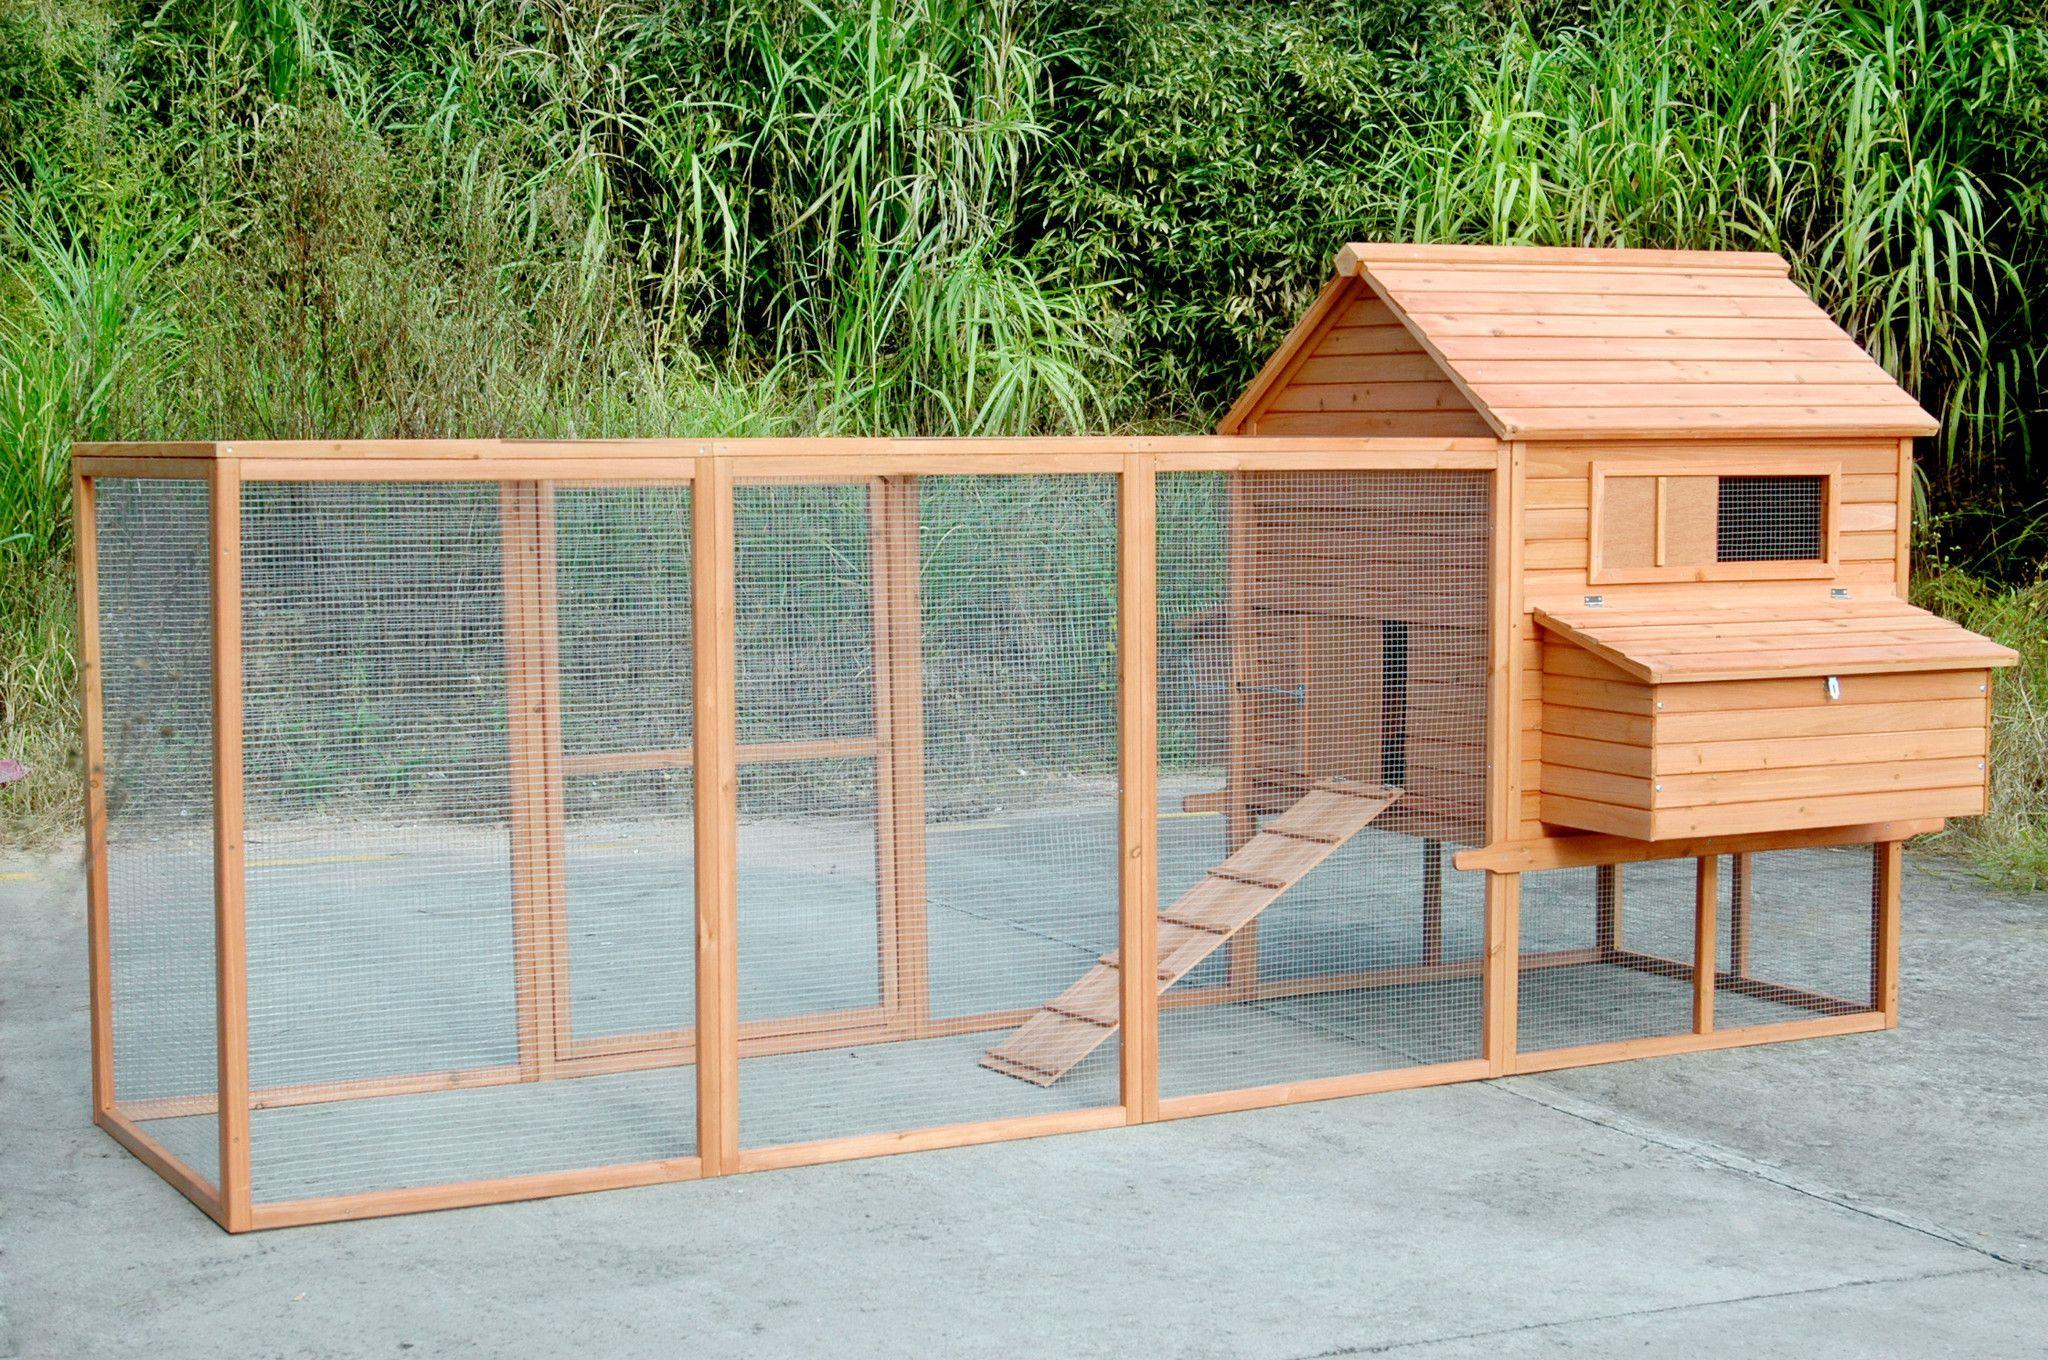 Rhode Island Homestead Xl Chicken Coop And Run Extension 10